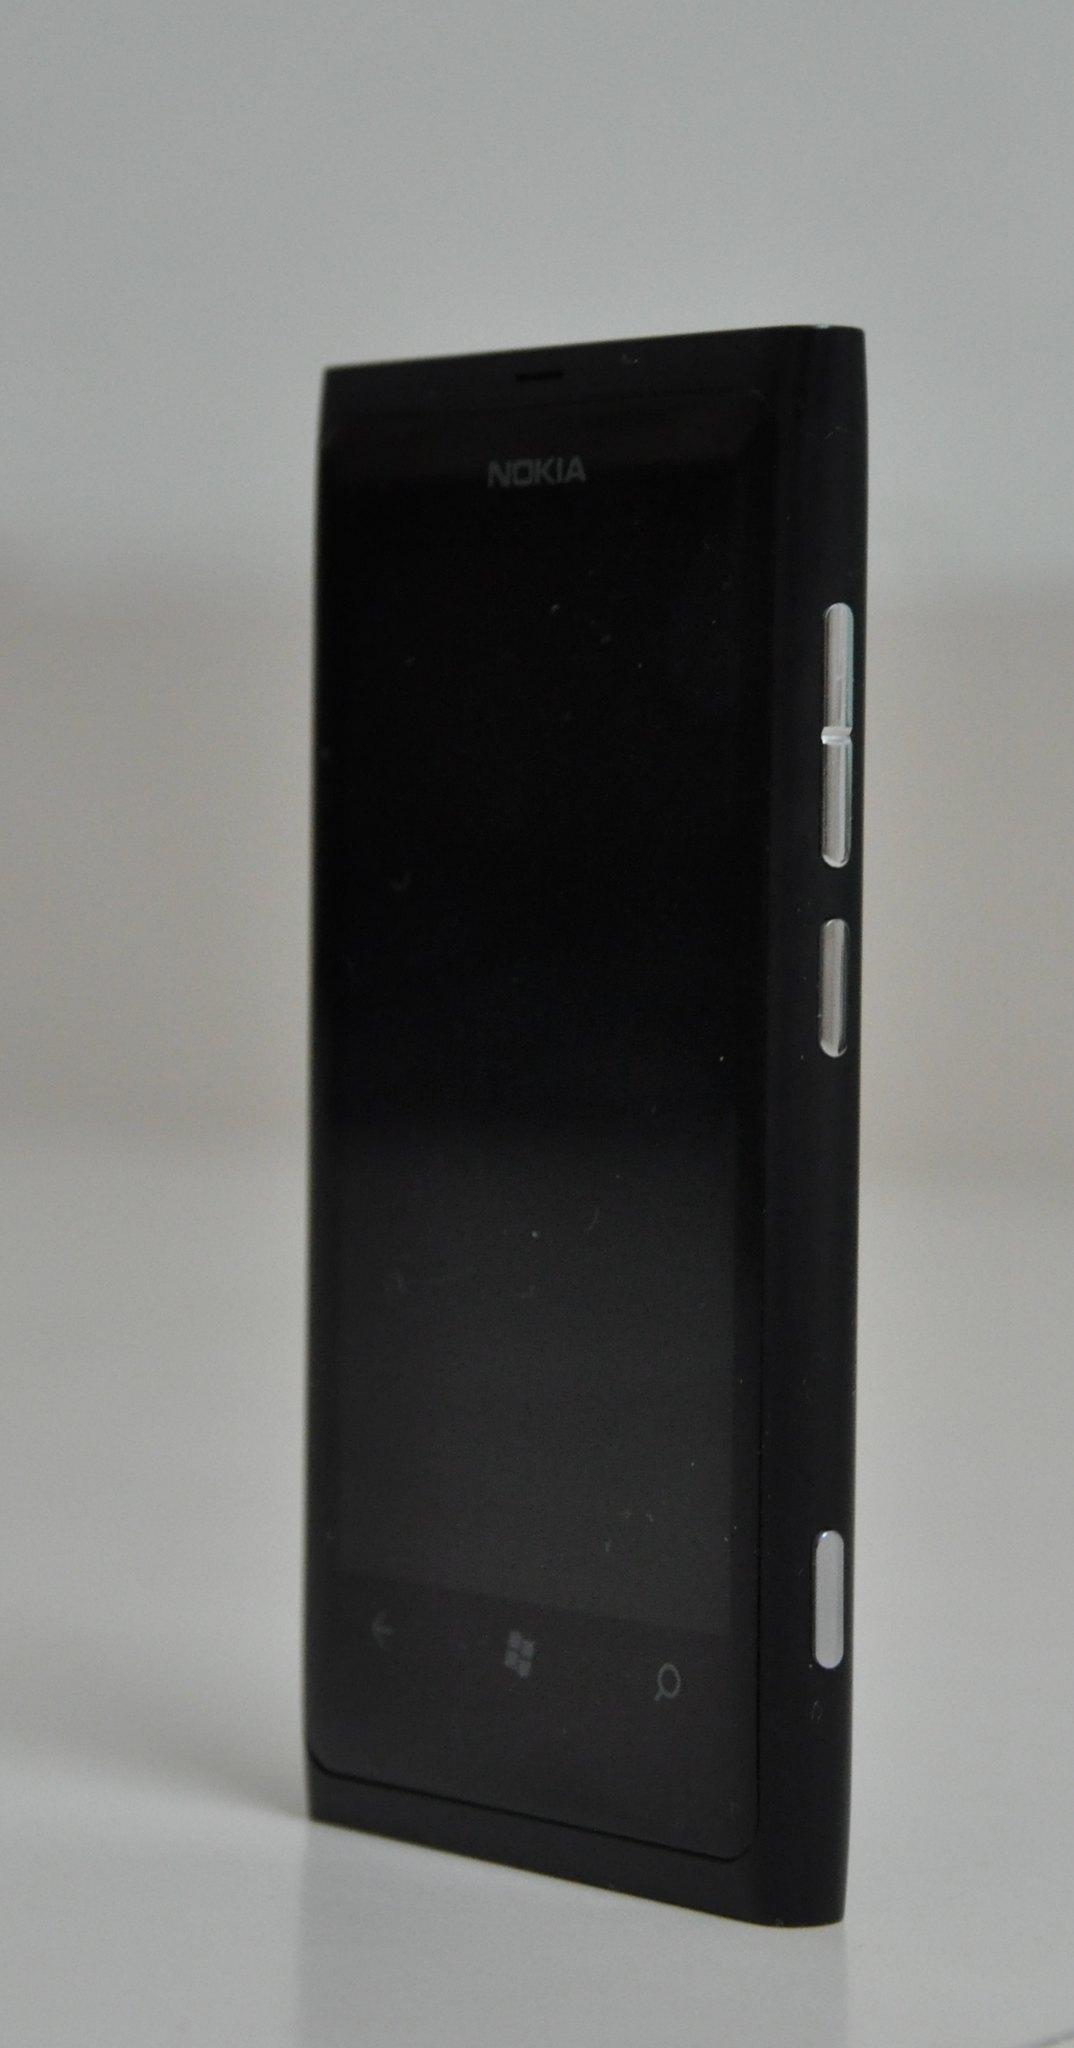 Nokia Lumia 800 side